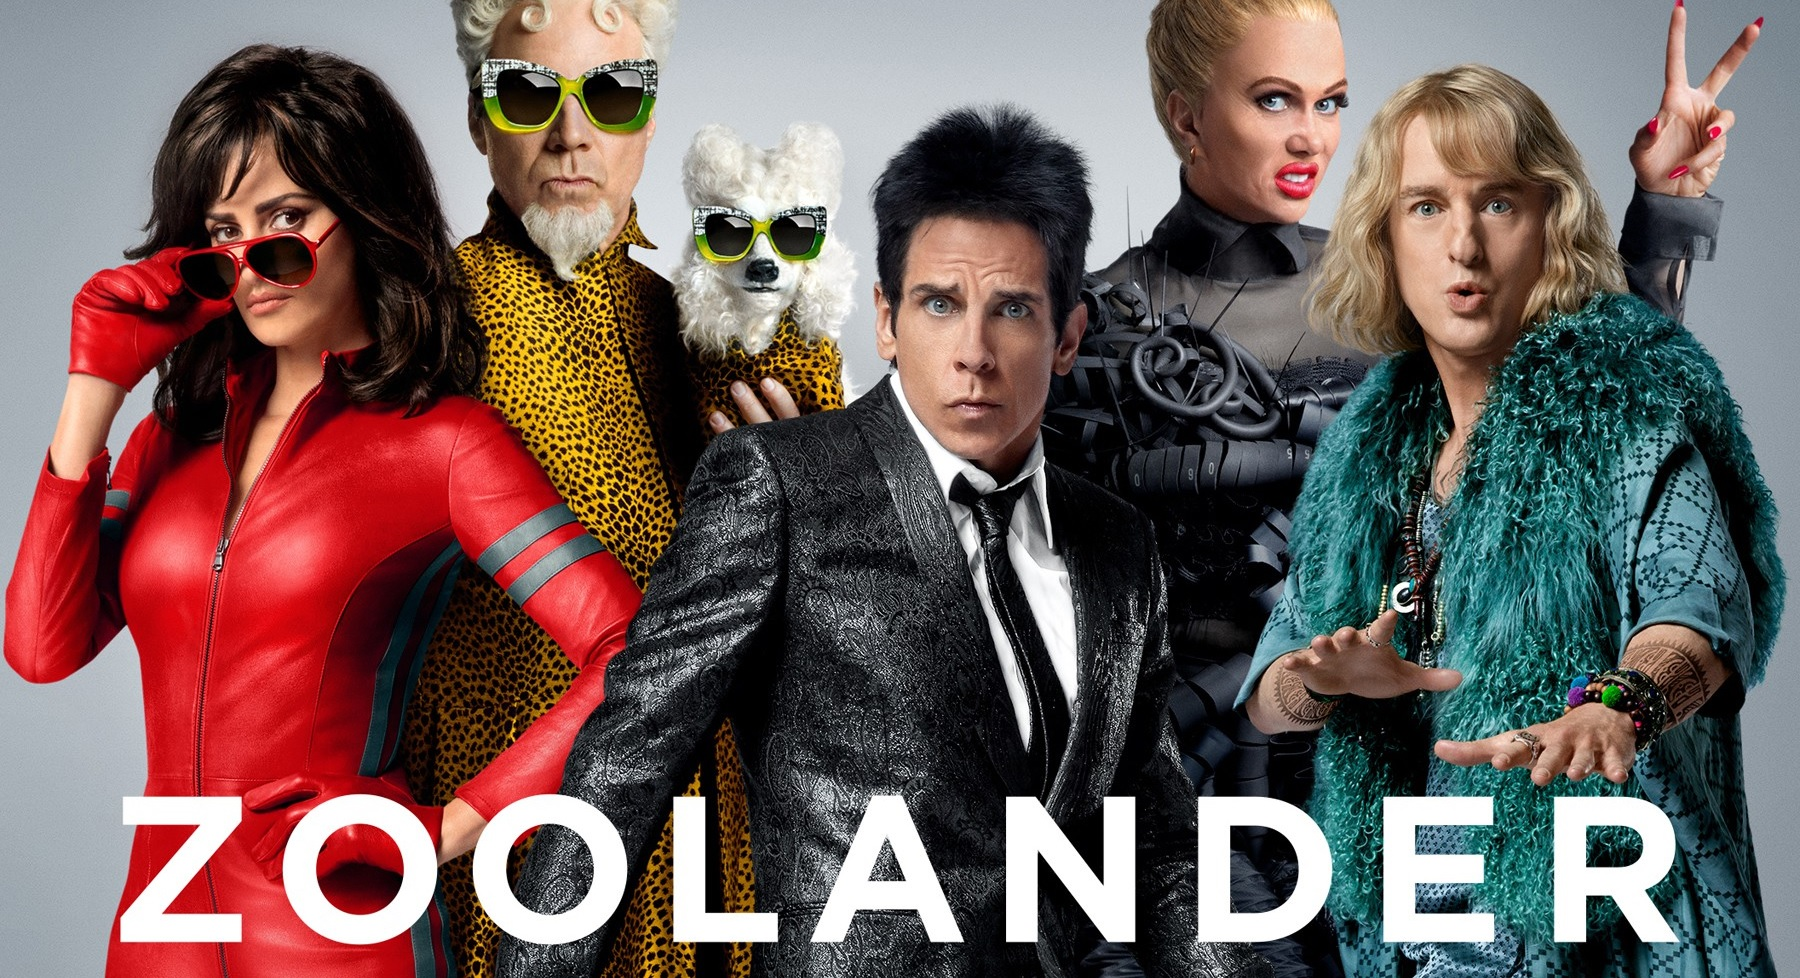 Zoolander 2 picture free download Zoolander 2 (2016) - Grog's Movie Review - GMB picture free download